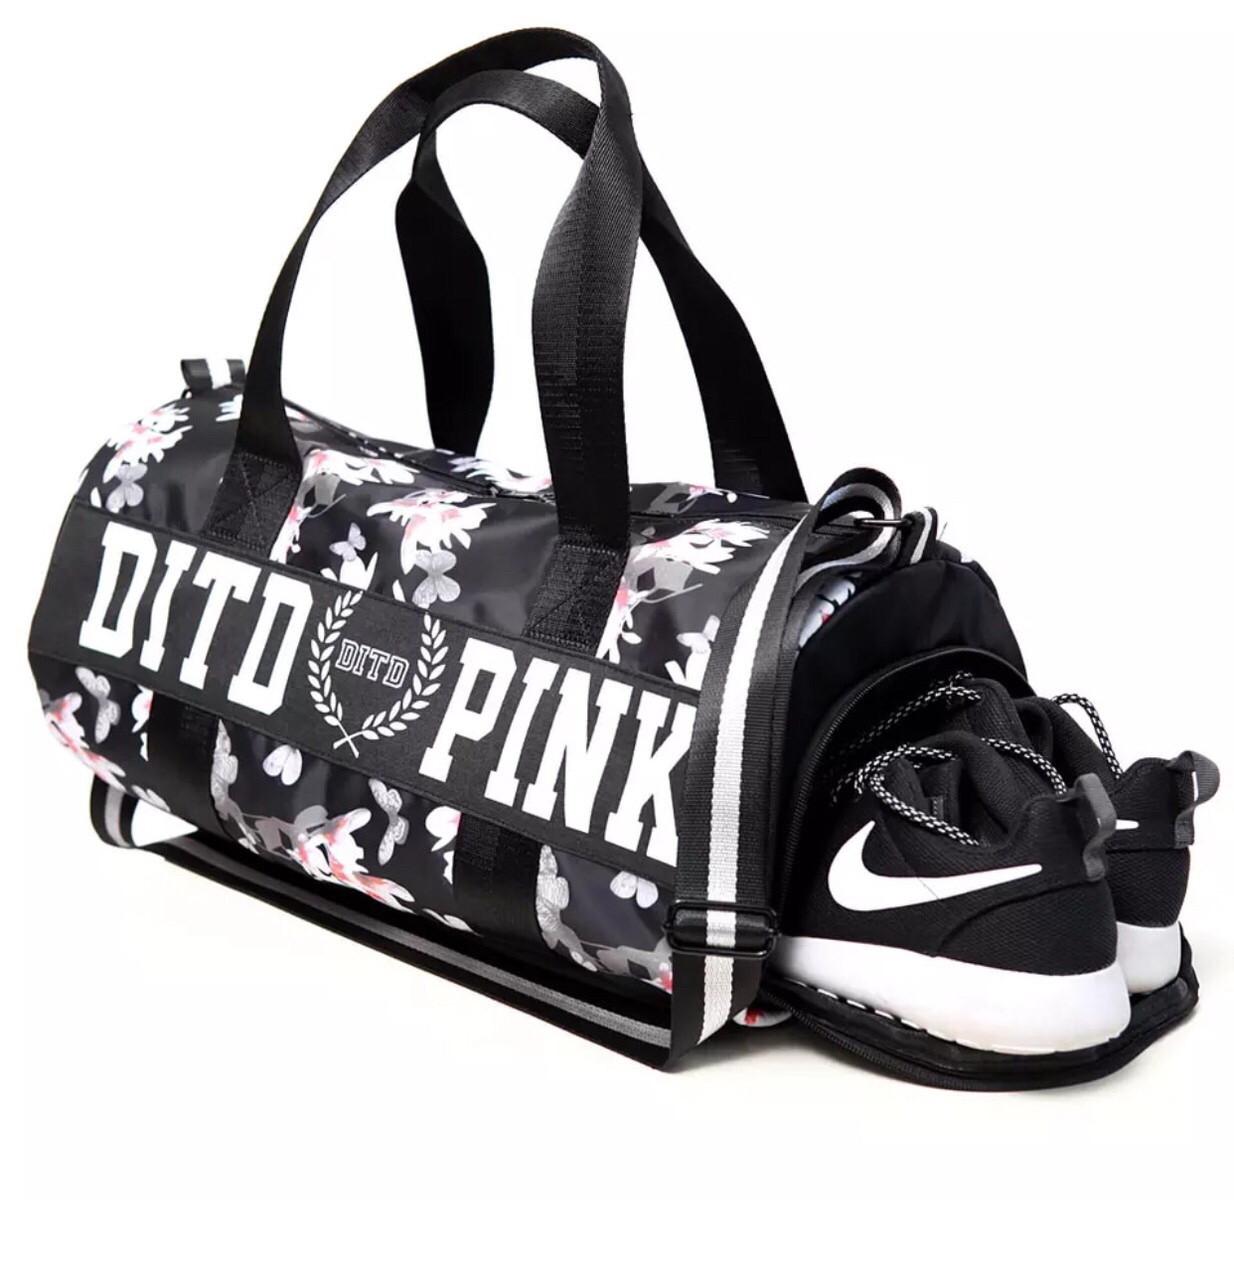 5afee7356a192 Спортивная сумка Victoria`s Secret DITO PINK , цена 750 грн., купить в  Харькове — Prom.ua (ID#666465617)